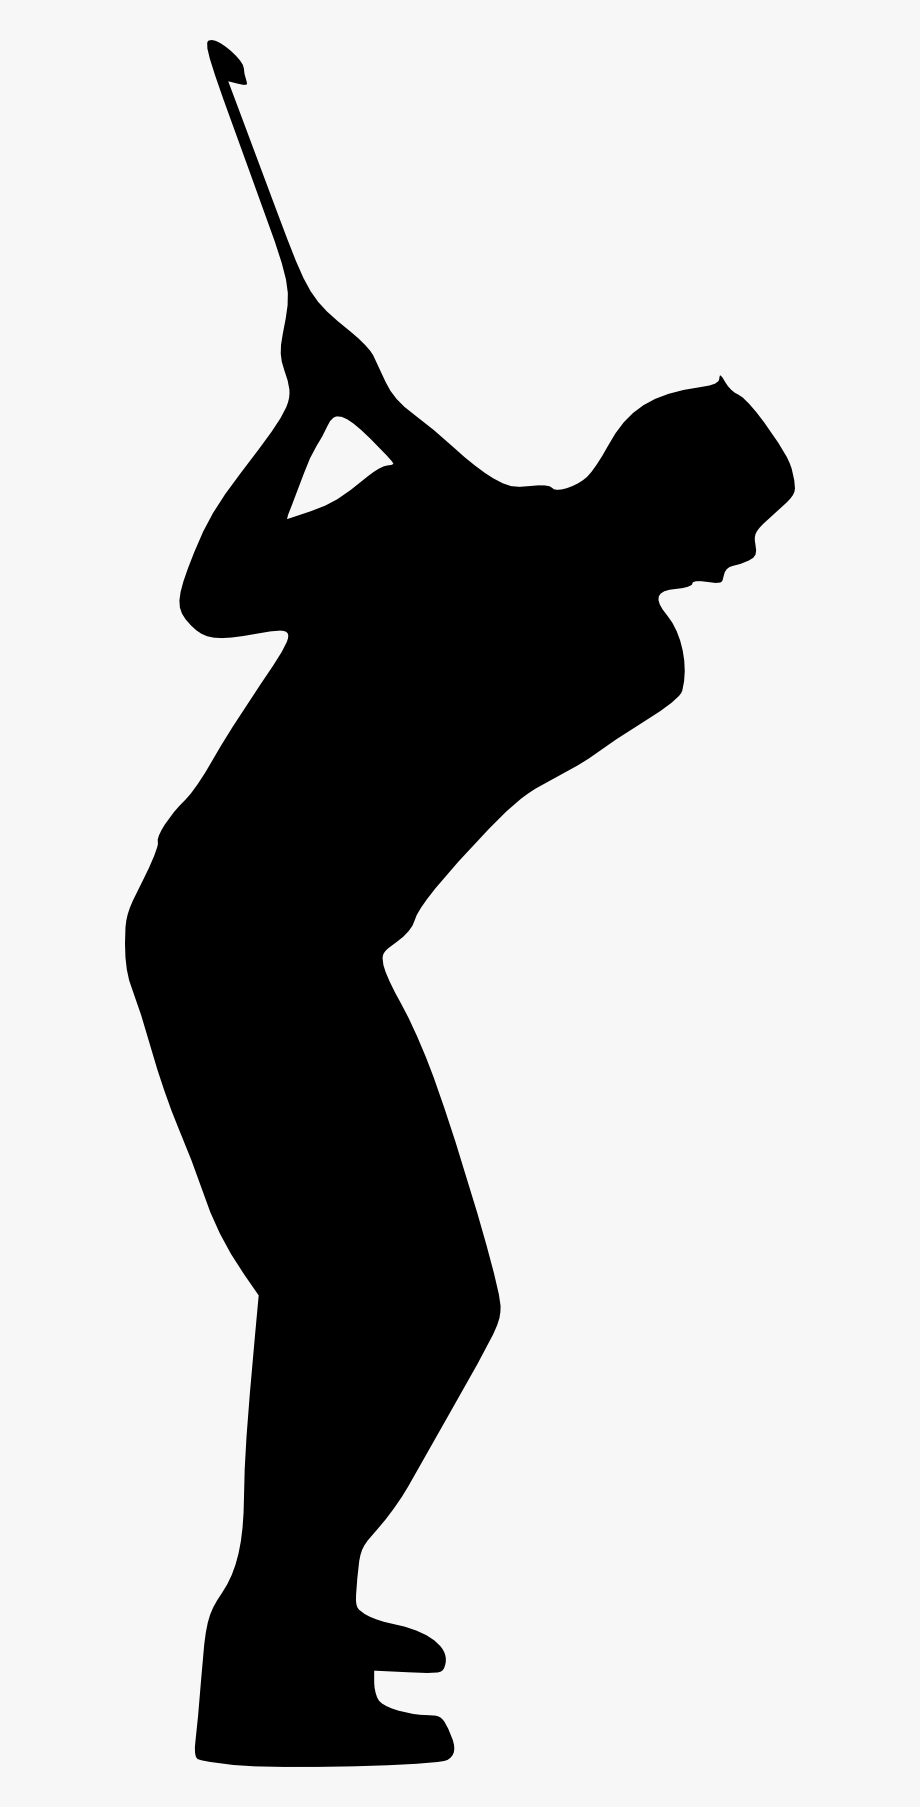 Mini bar black and white siloette clipart graphic transparent download Clipart Transparent Stock Golf Course Silhouette At ... graphic transparent download